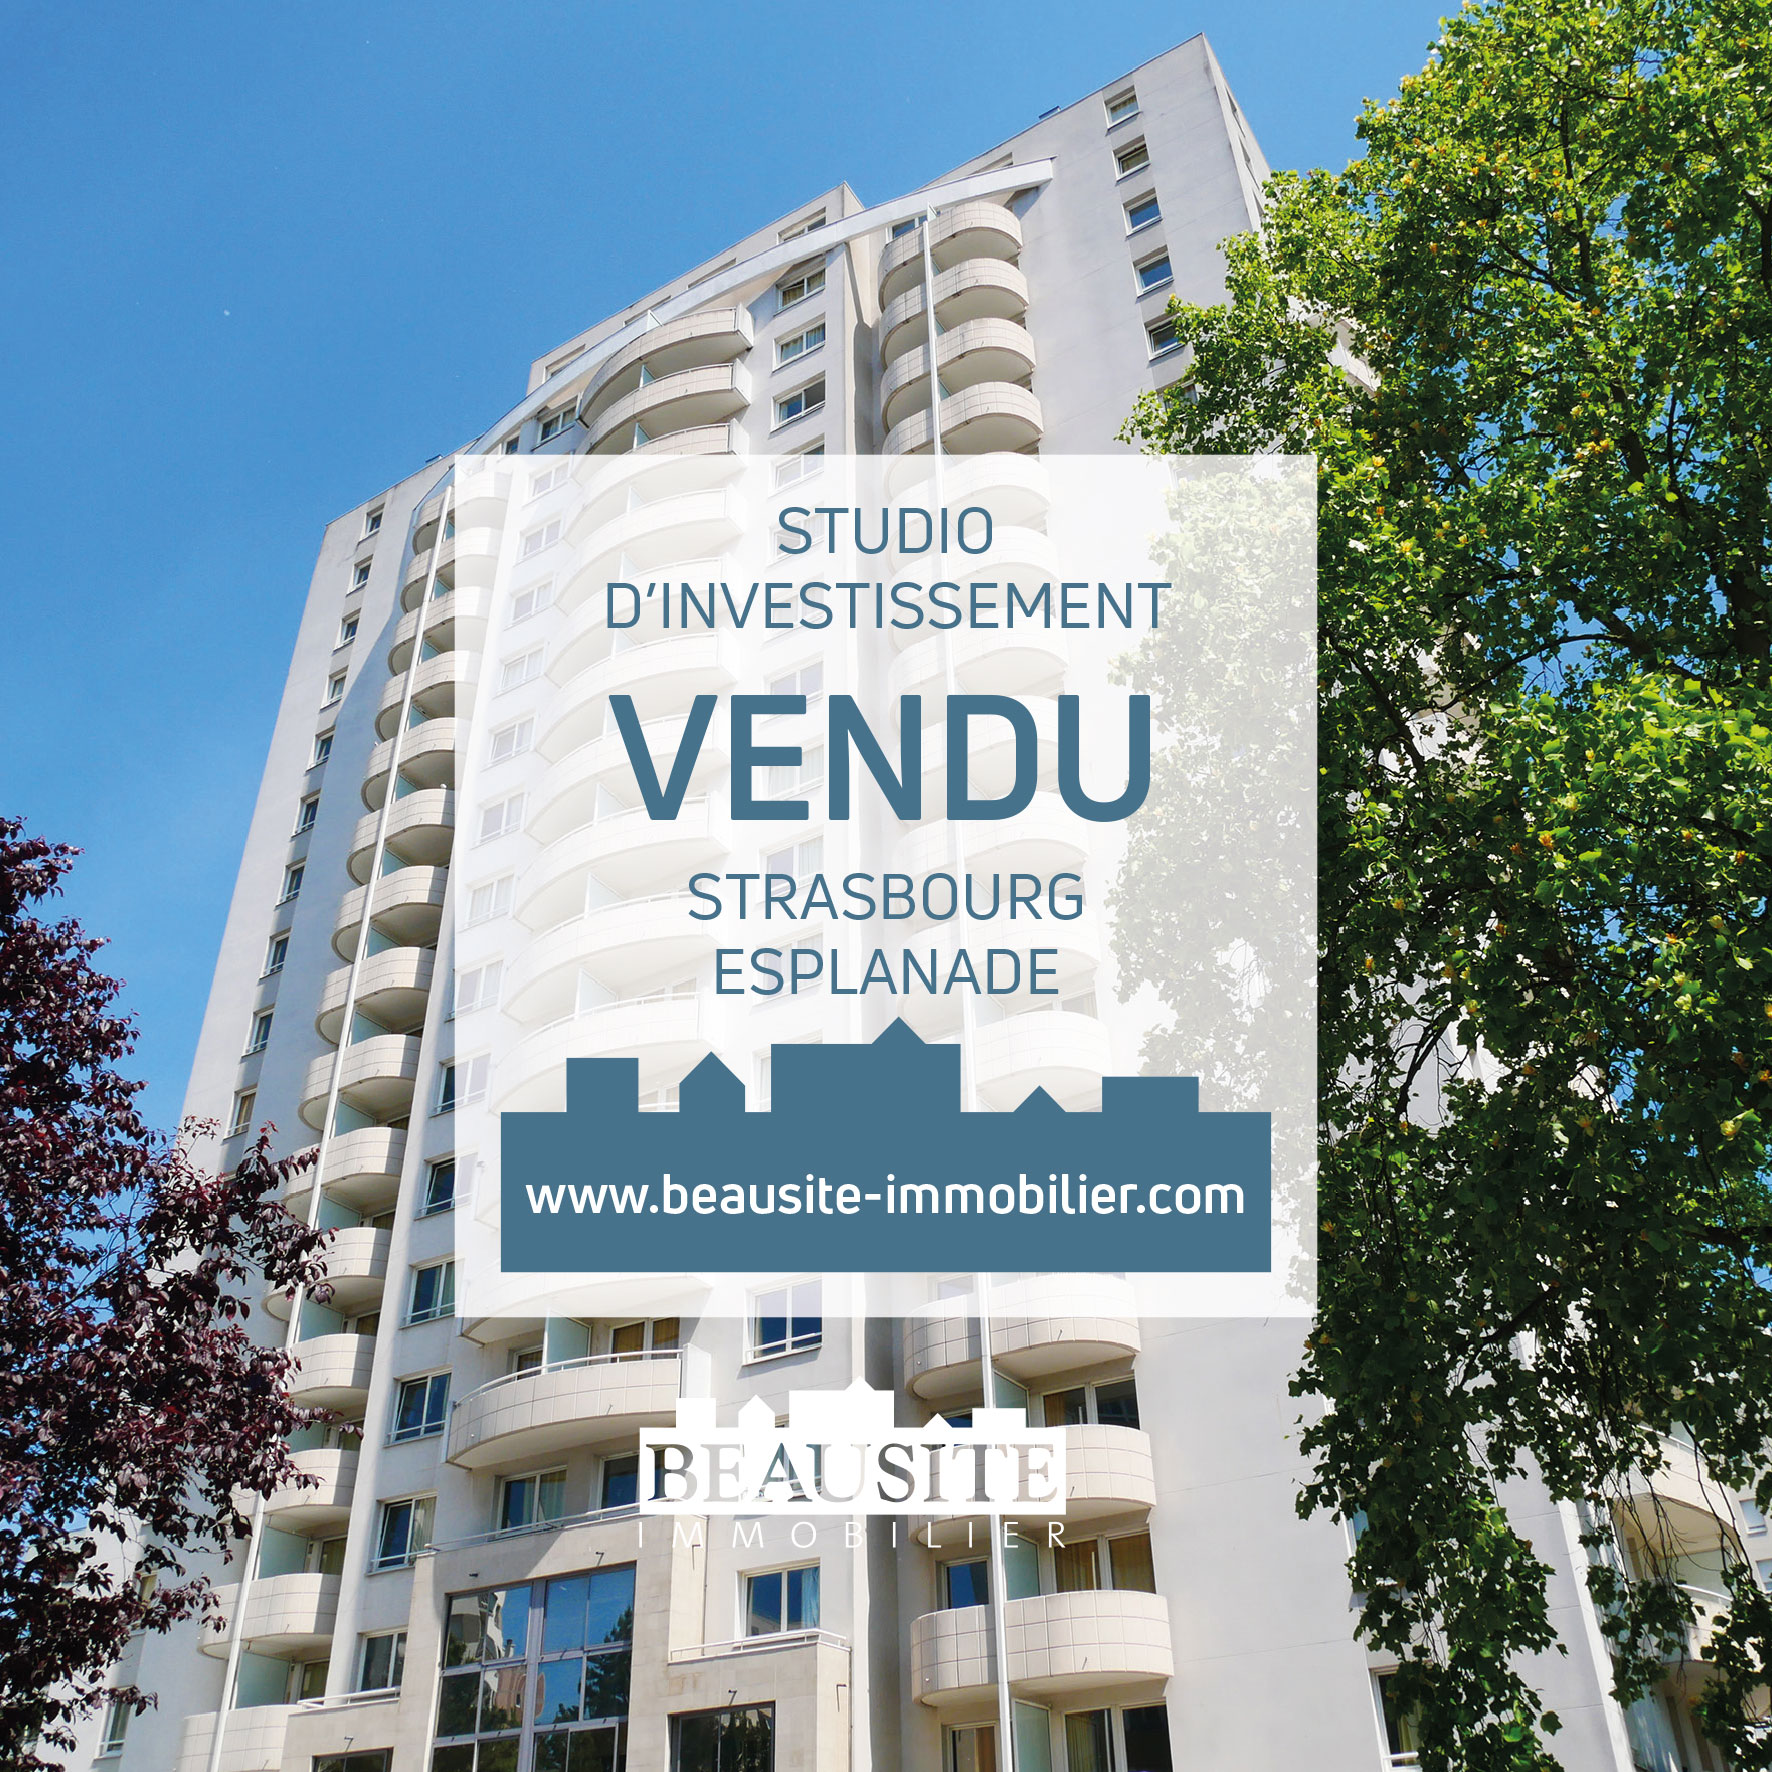 VENDU - Lumineux studio avec balcon - Strasbourg Esplanade - nos ventes - Beausite Immobilier 1